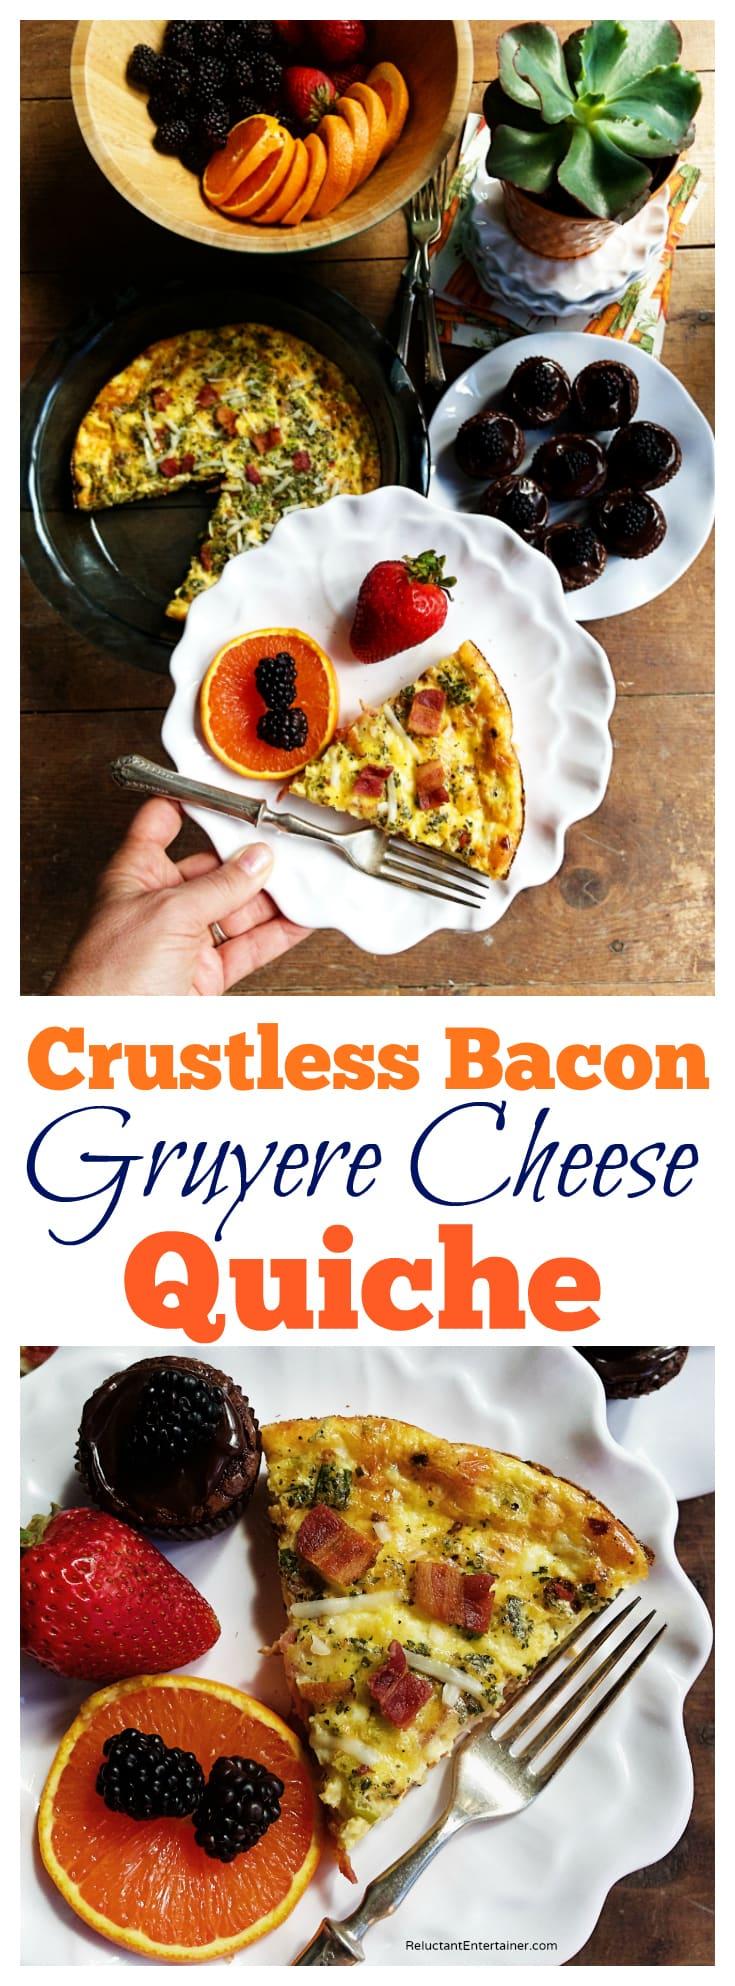 Crustless Bacon Gruyere Cheese Quiche